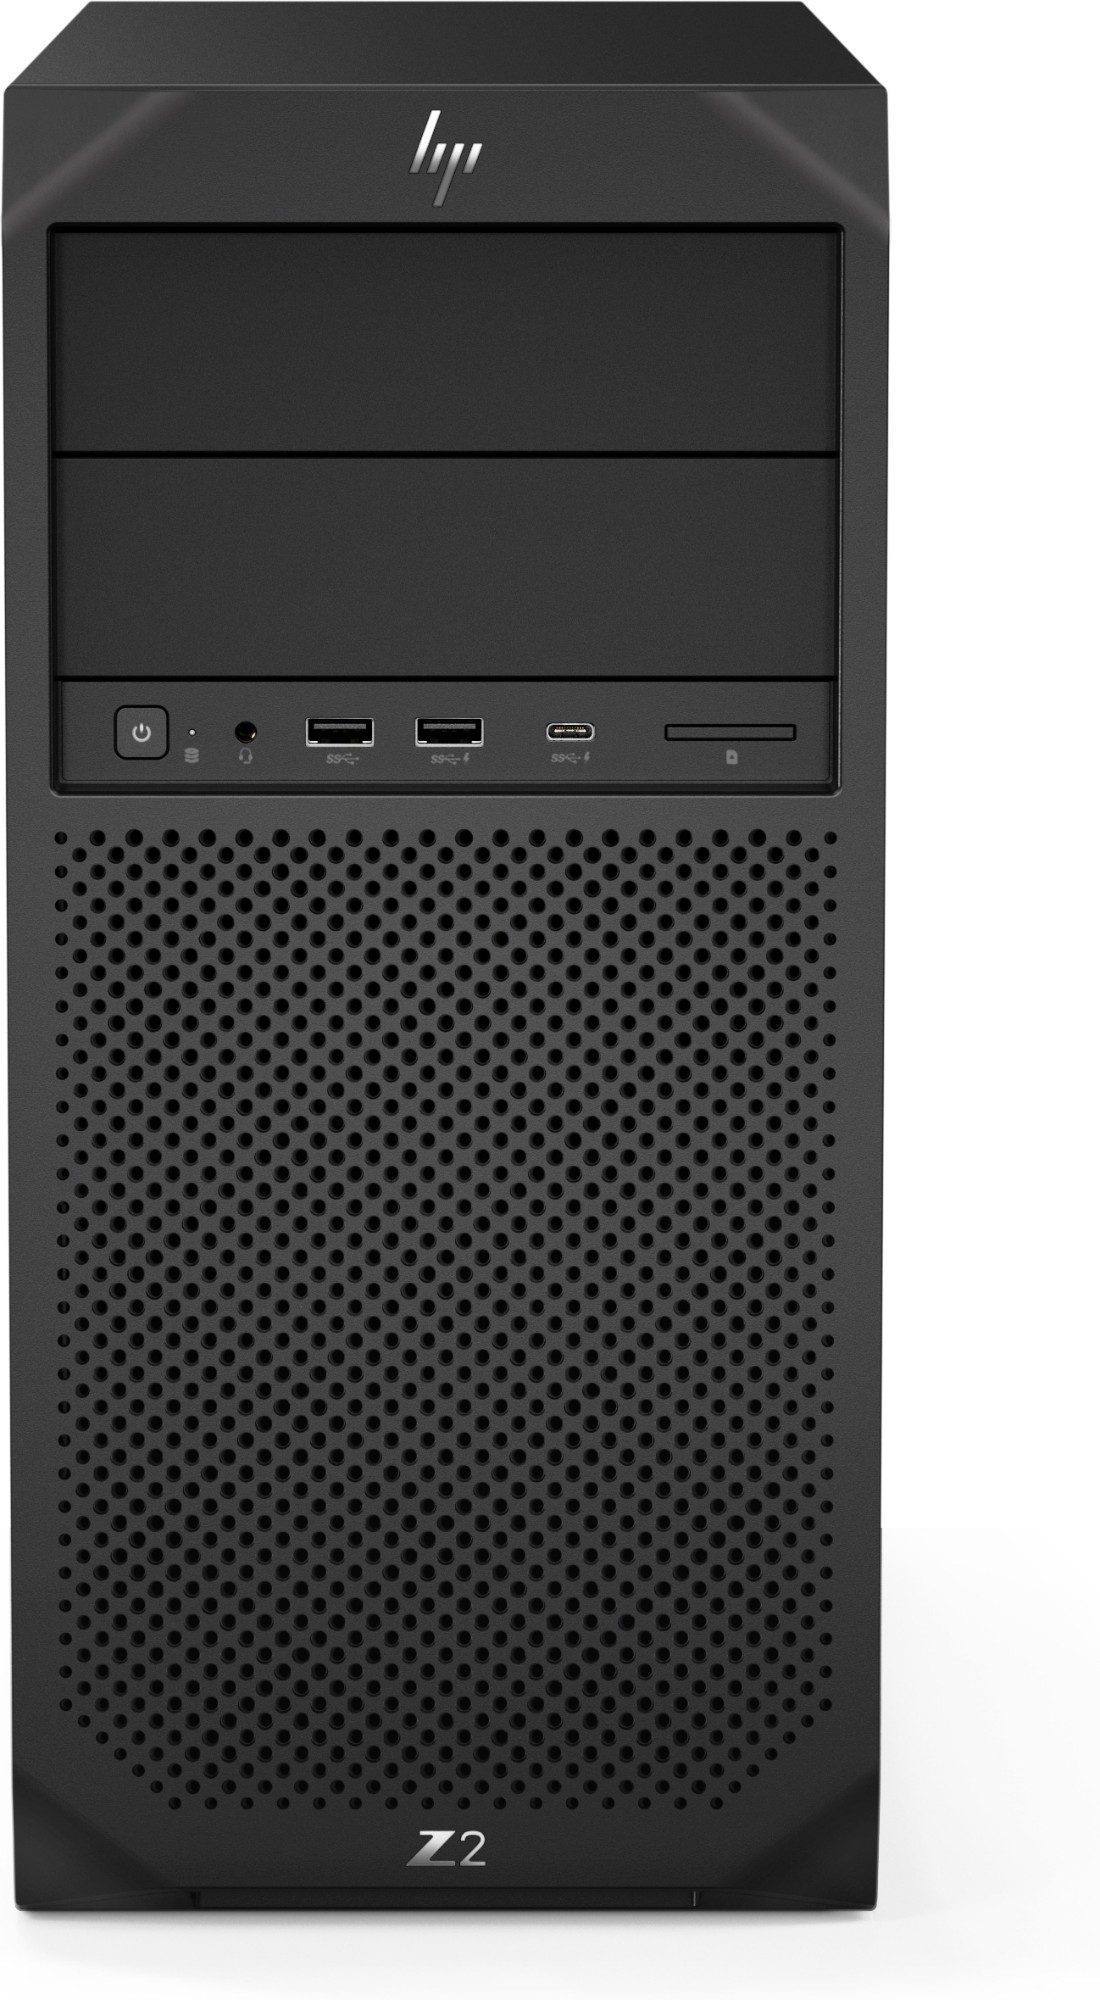 HP Z2 G4 9th gen Intel® Core™ i7 i7-9700 8 GB DDR4-SDRAM 256 GB SSD Tower Black Workstation Windows 10 Pro